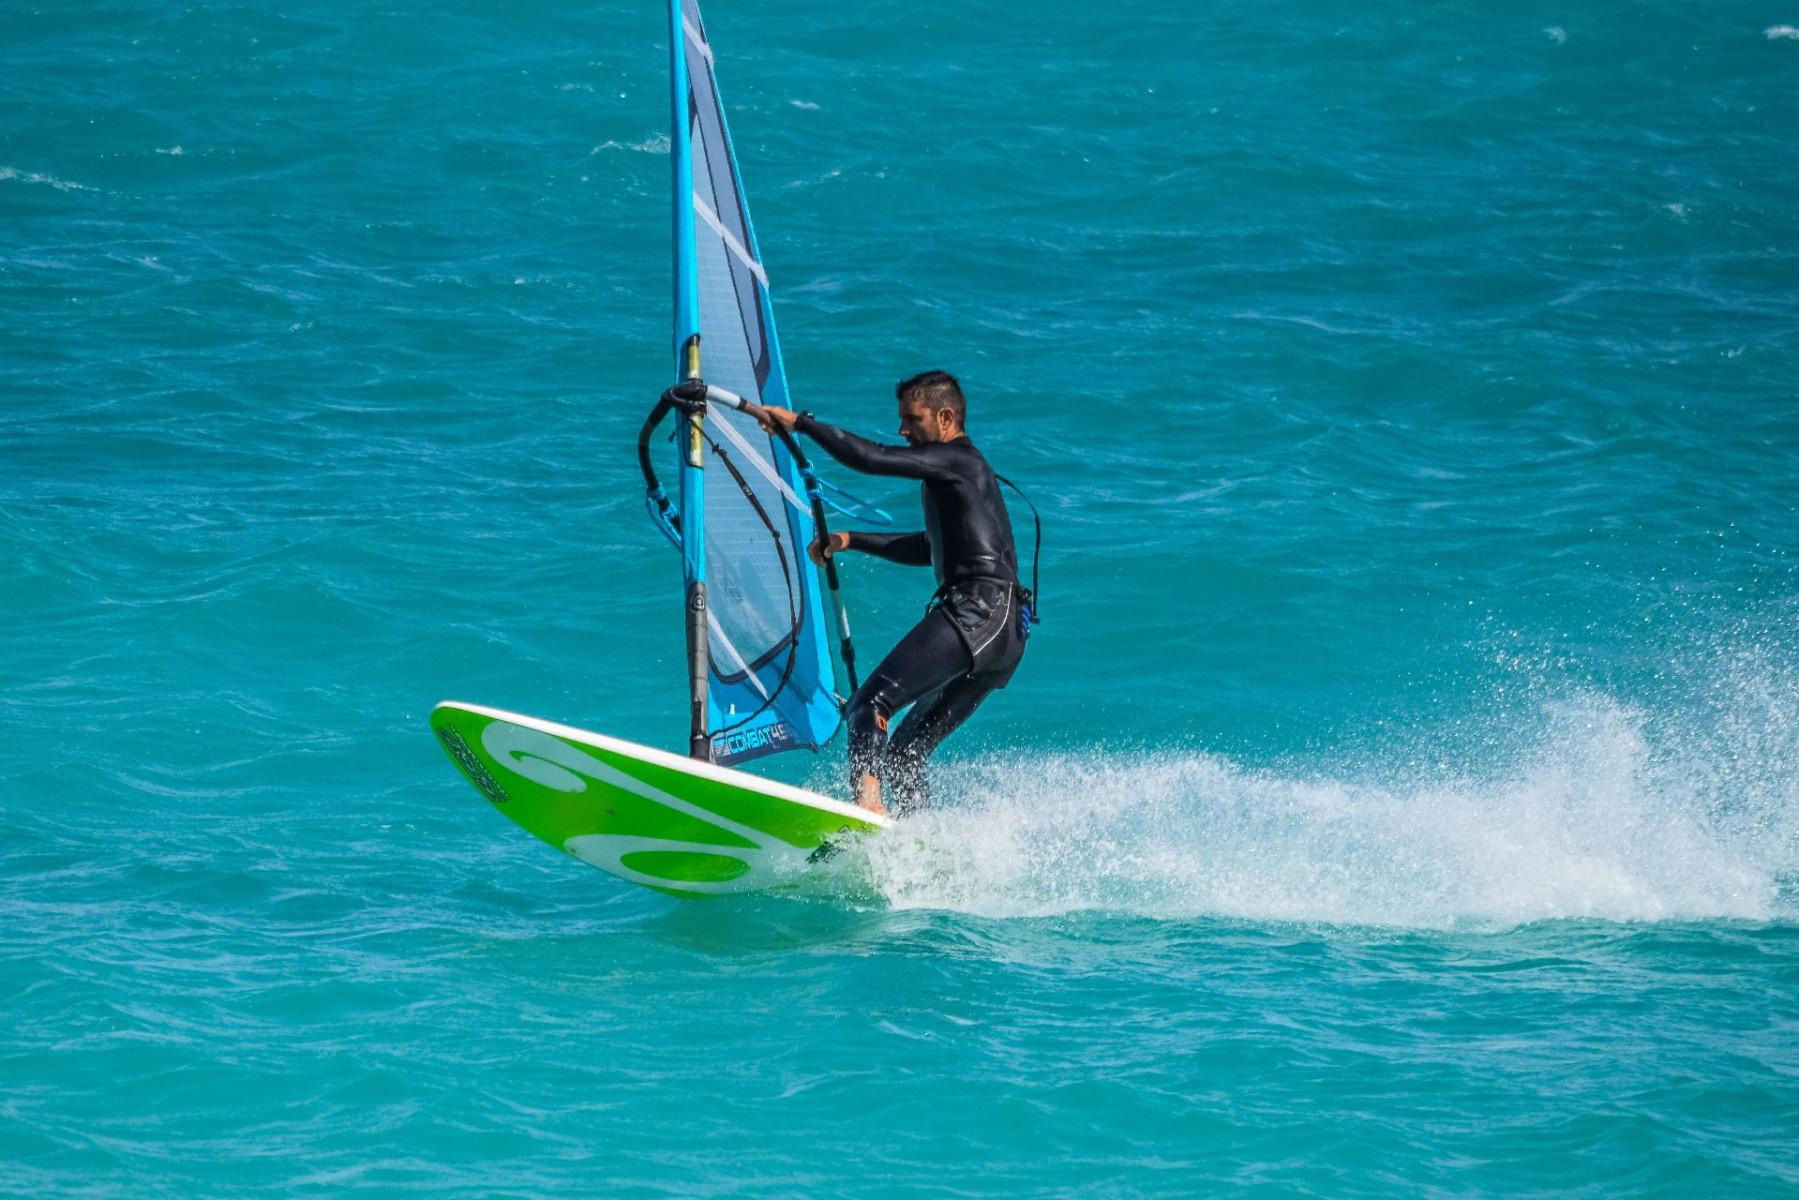 Corso base di windsurf a Bari Sardo in Ogliastra